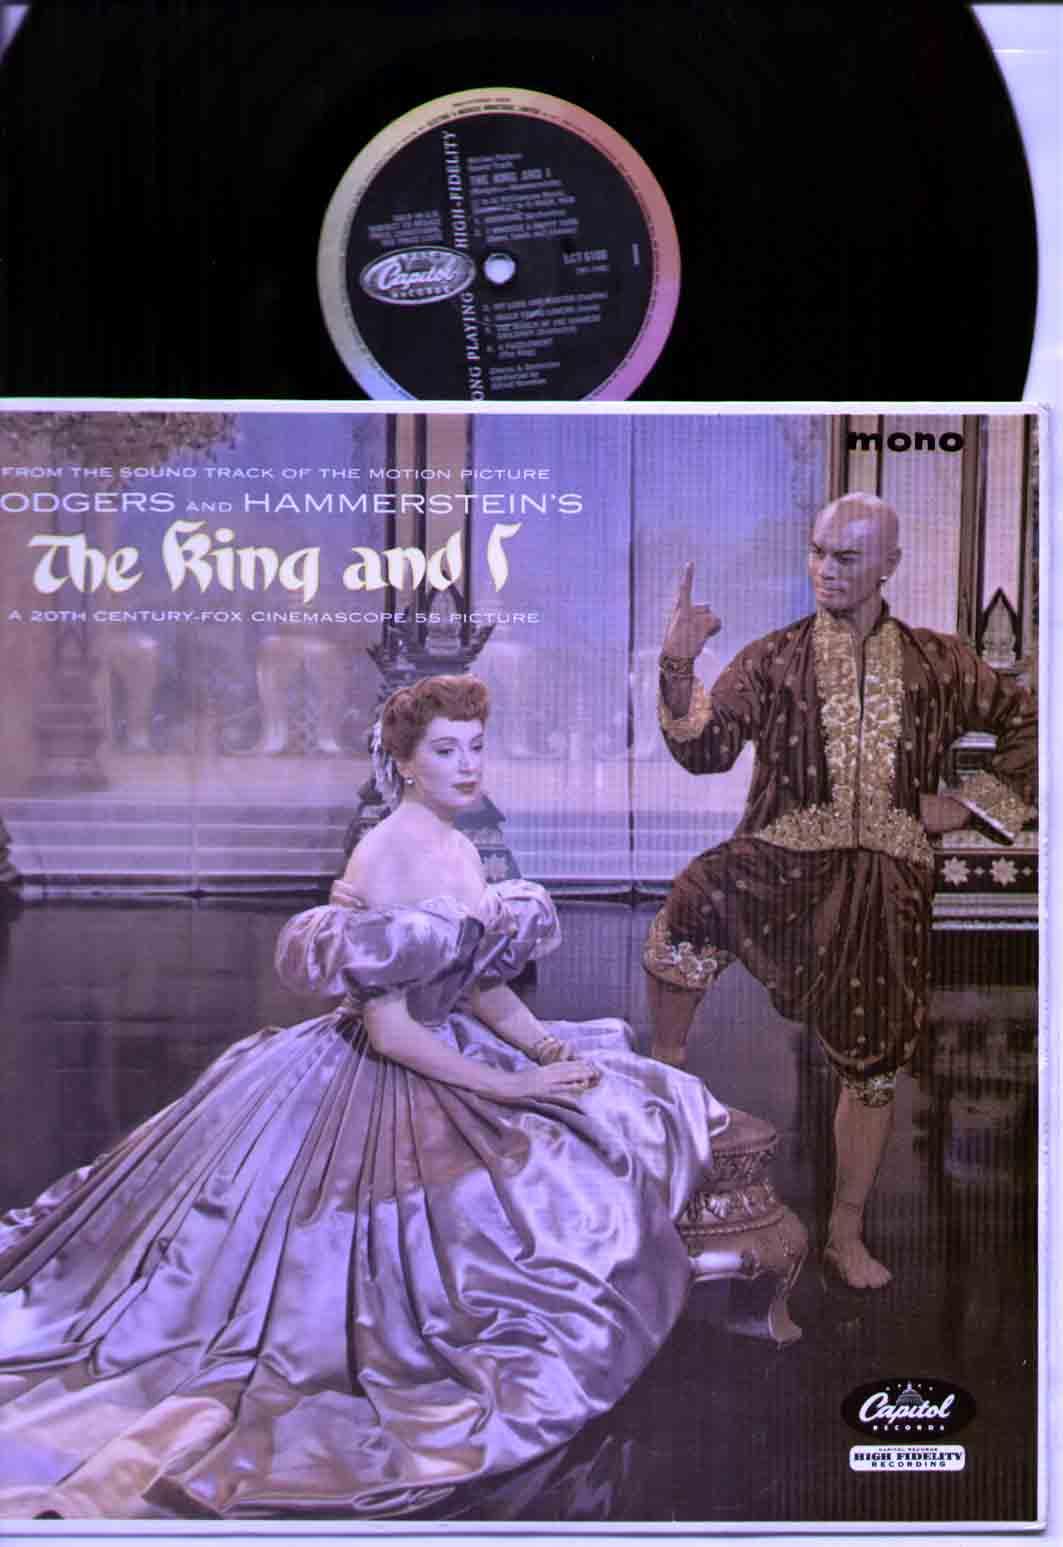 KING AND I SOUNDTRACK - mono original